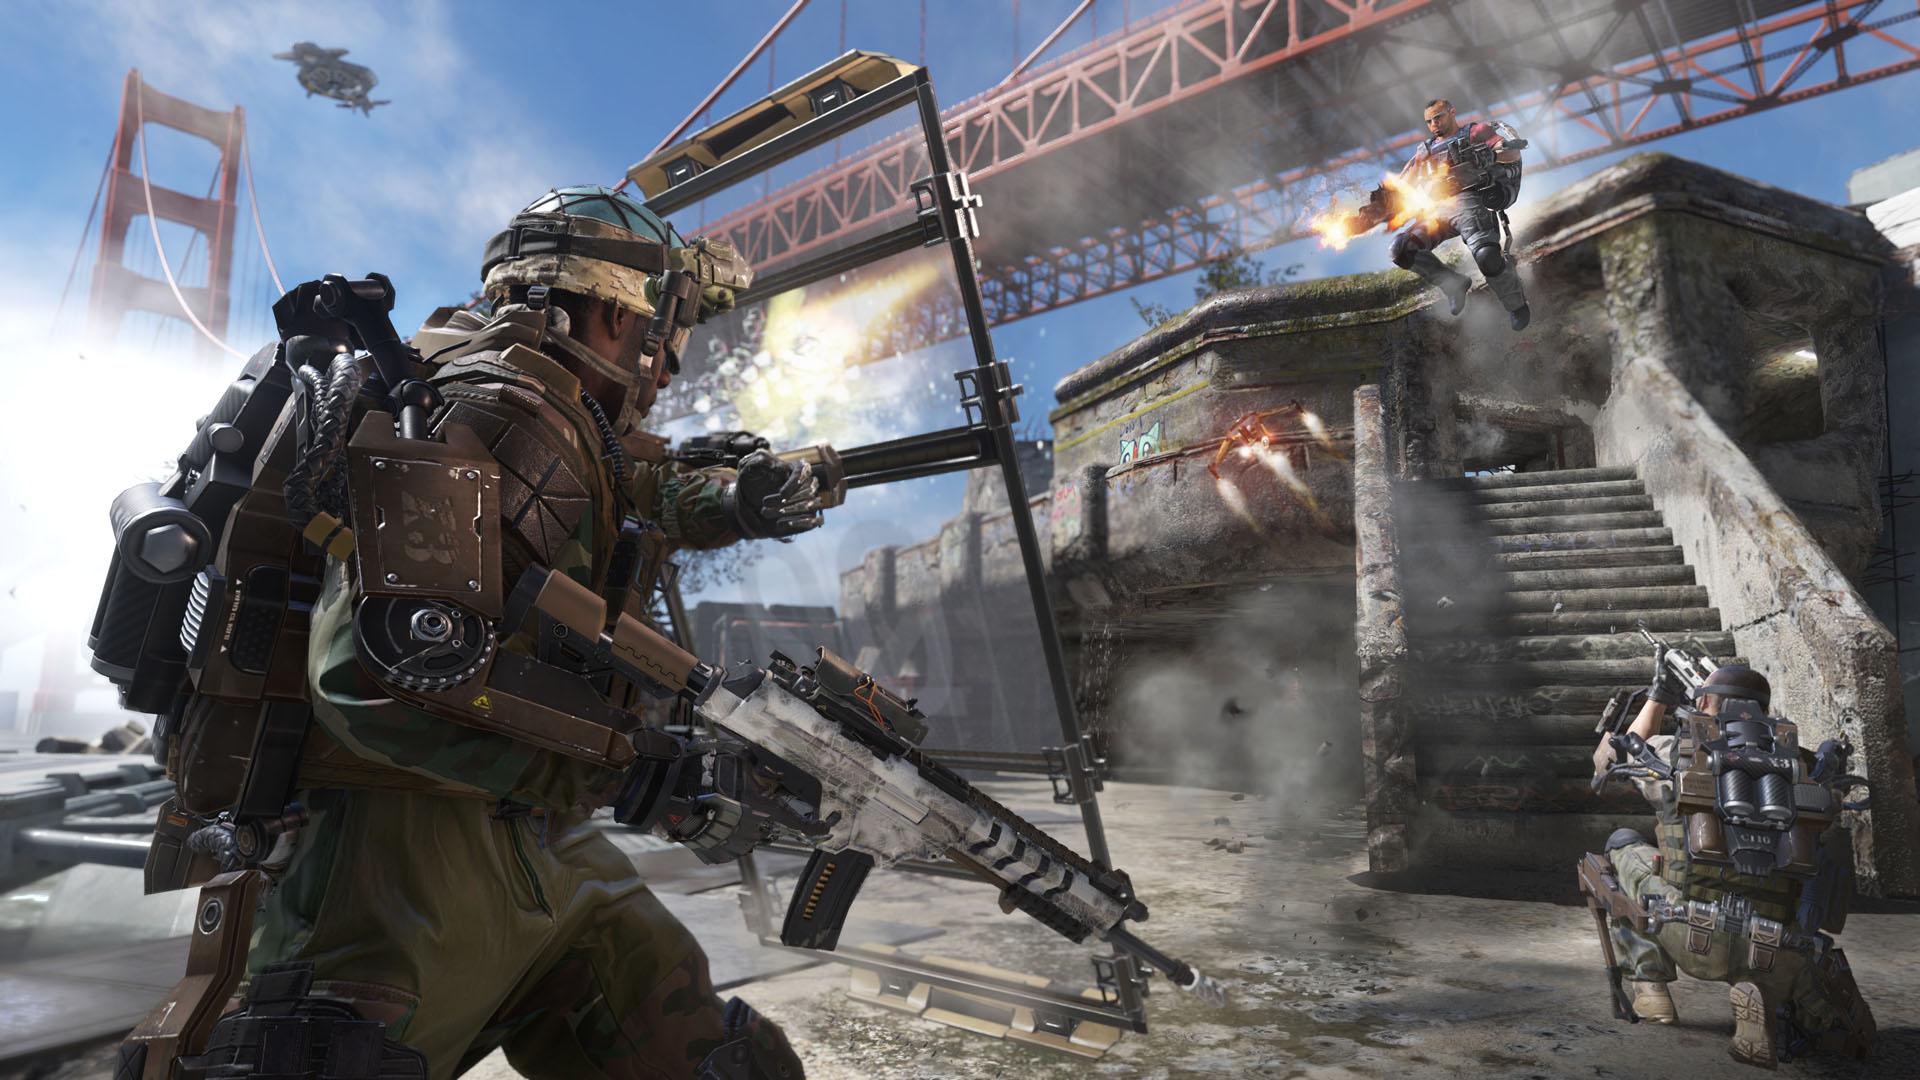 Destiny and Call of Duty: Advanced Warfare for $30 Saturday at the Microsoft Store